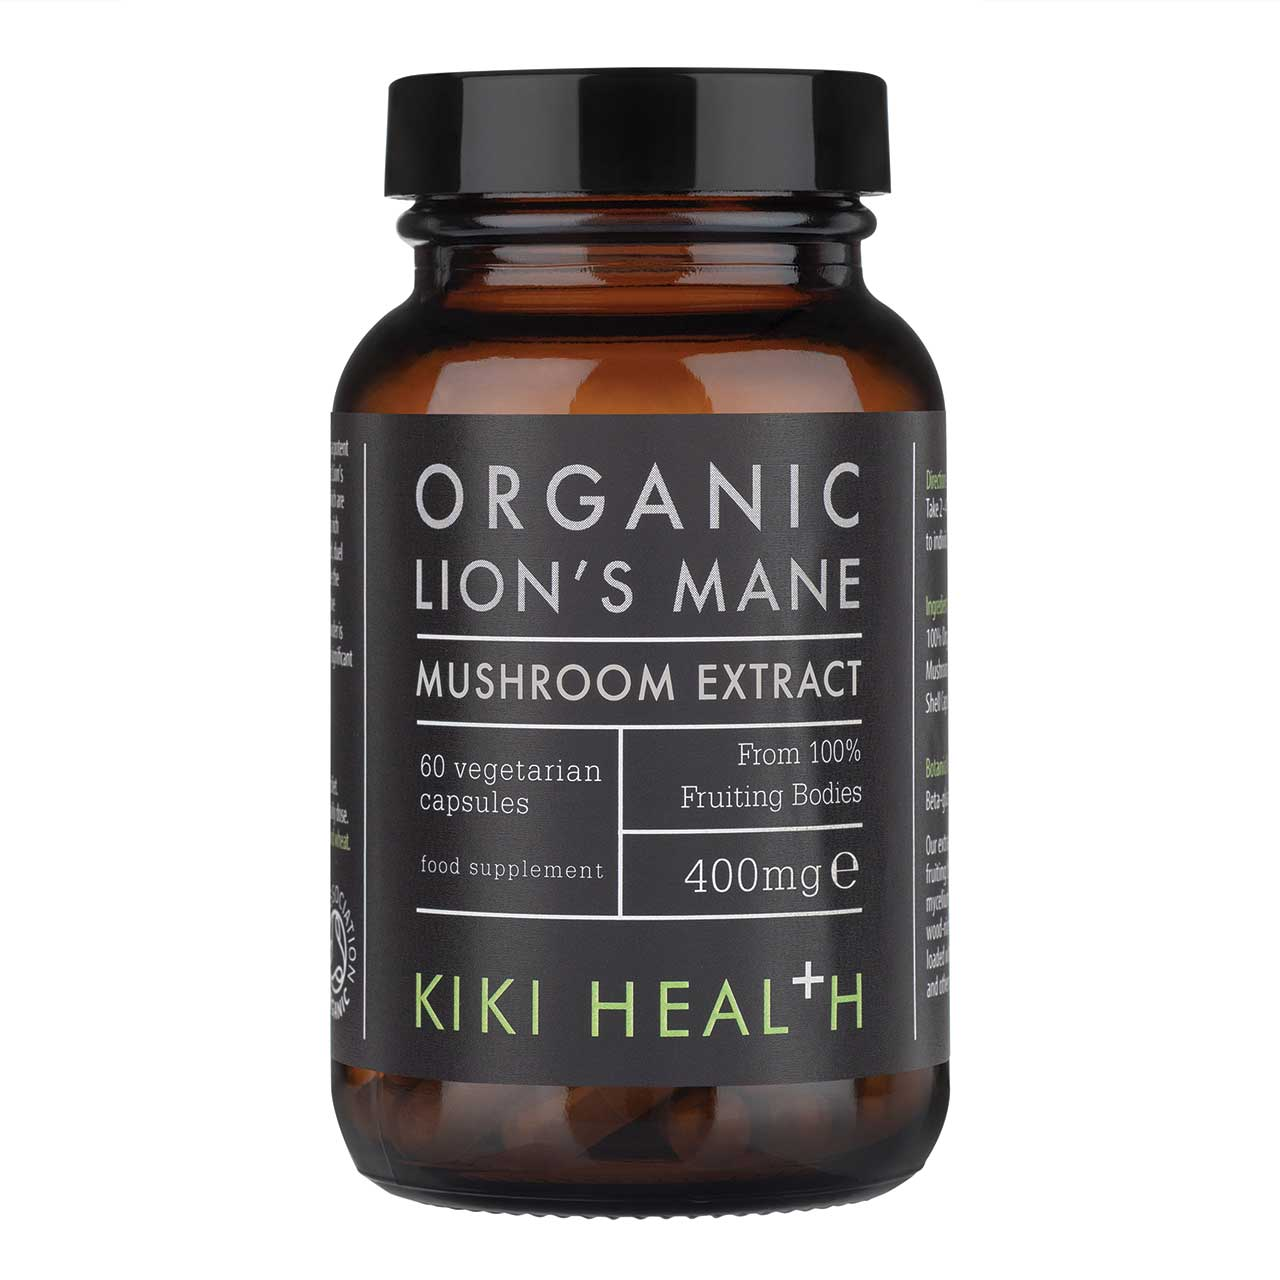 Organic Lion's Mane Mushroom Extract 60's